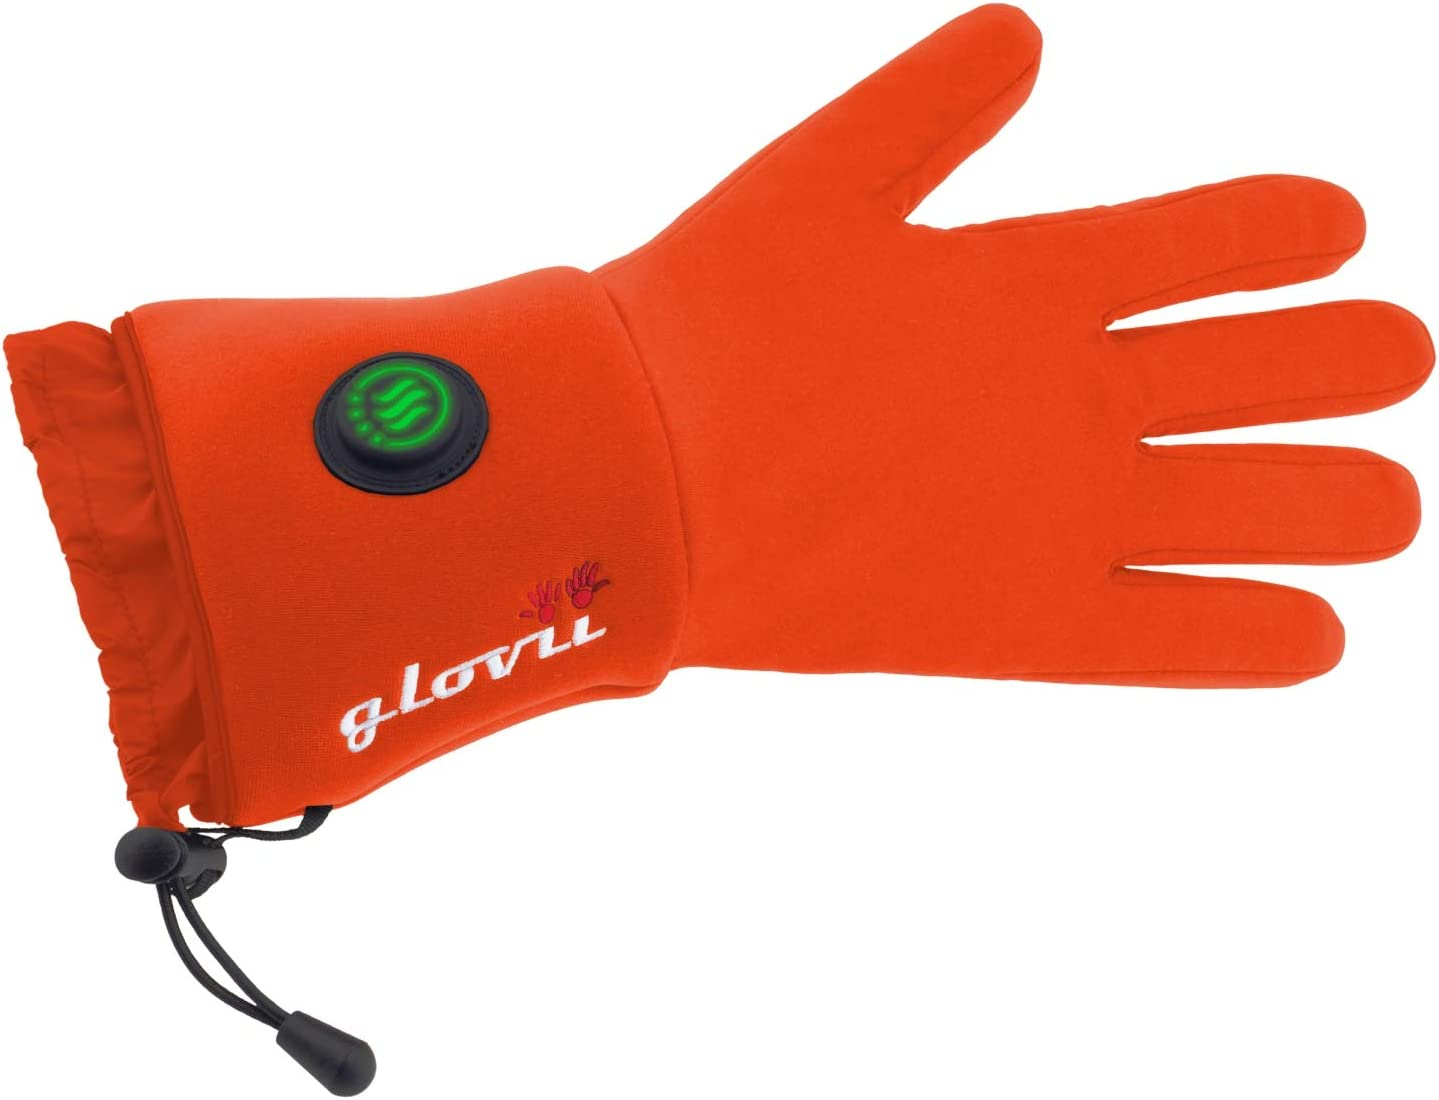 Glovii Gants Universel Batterie Chauff/ée Thermoactif XXS-XL